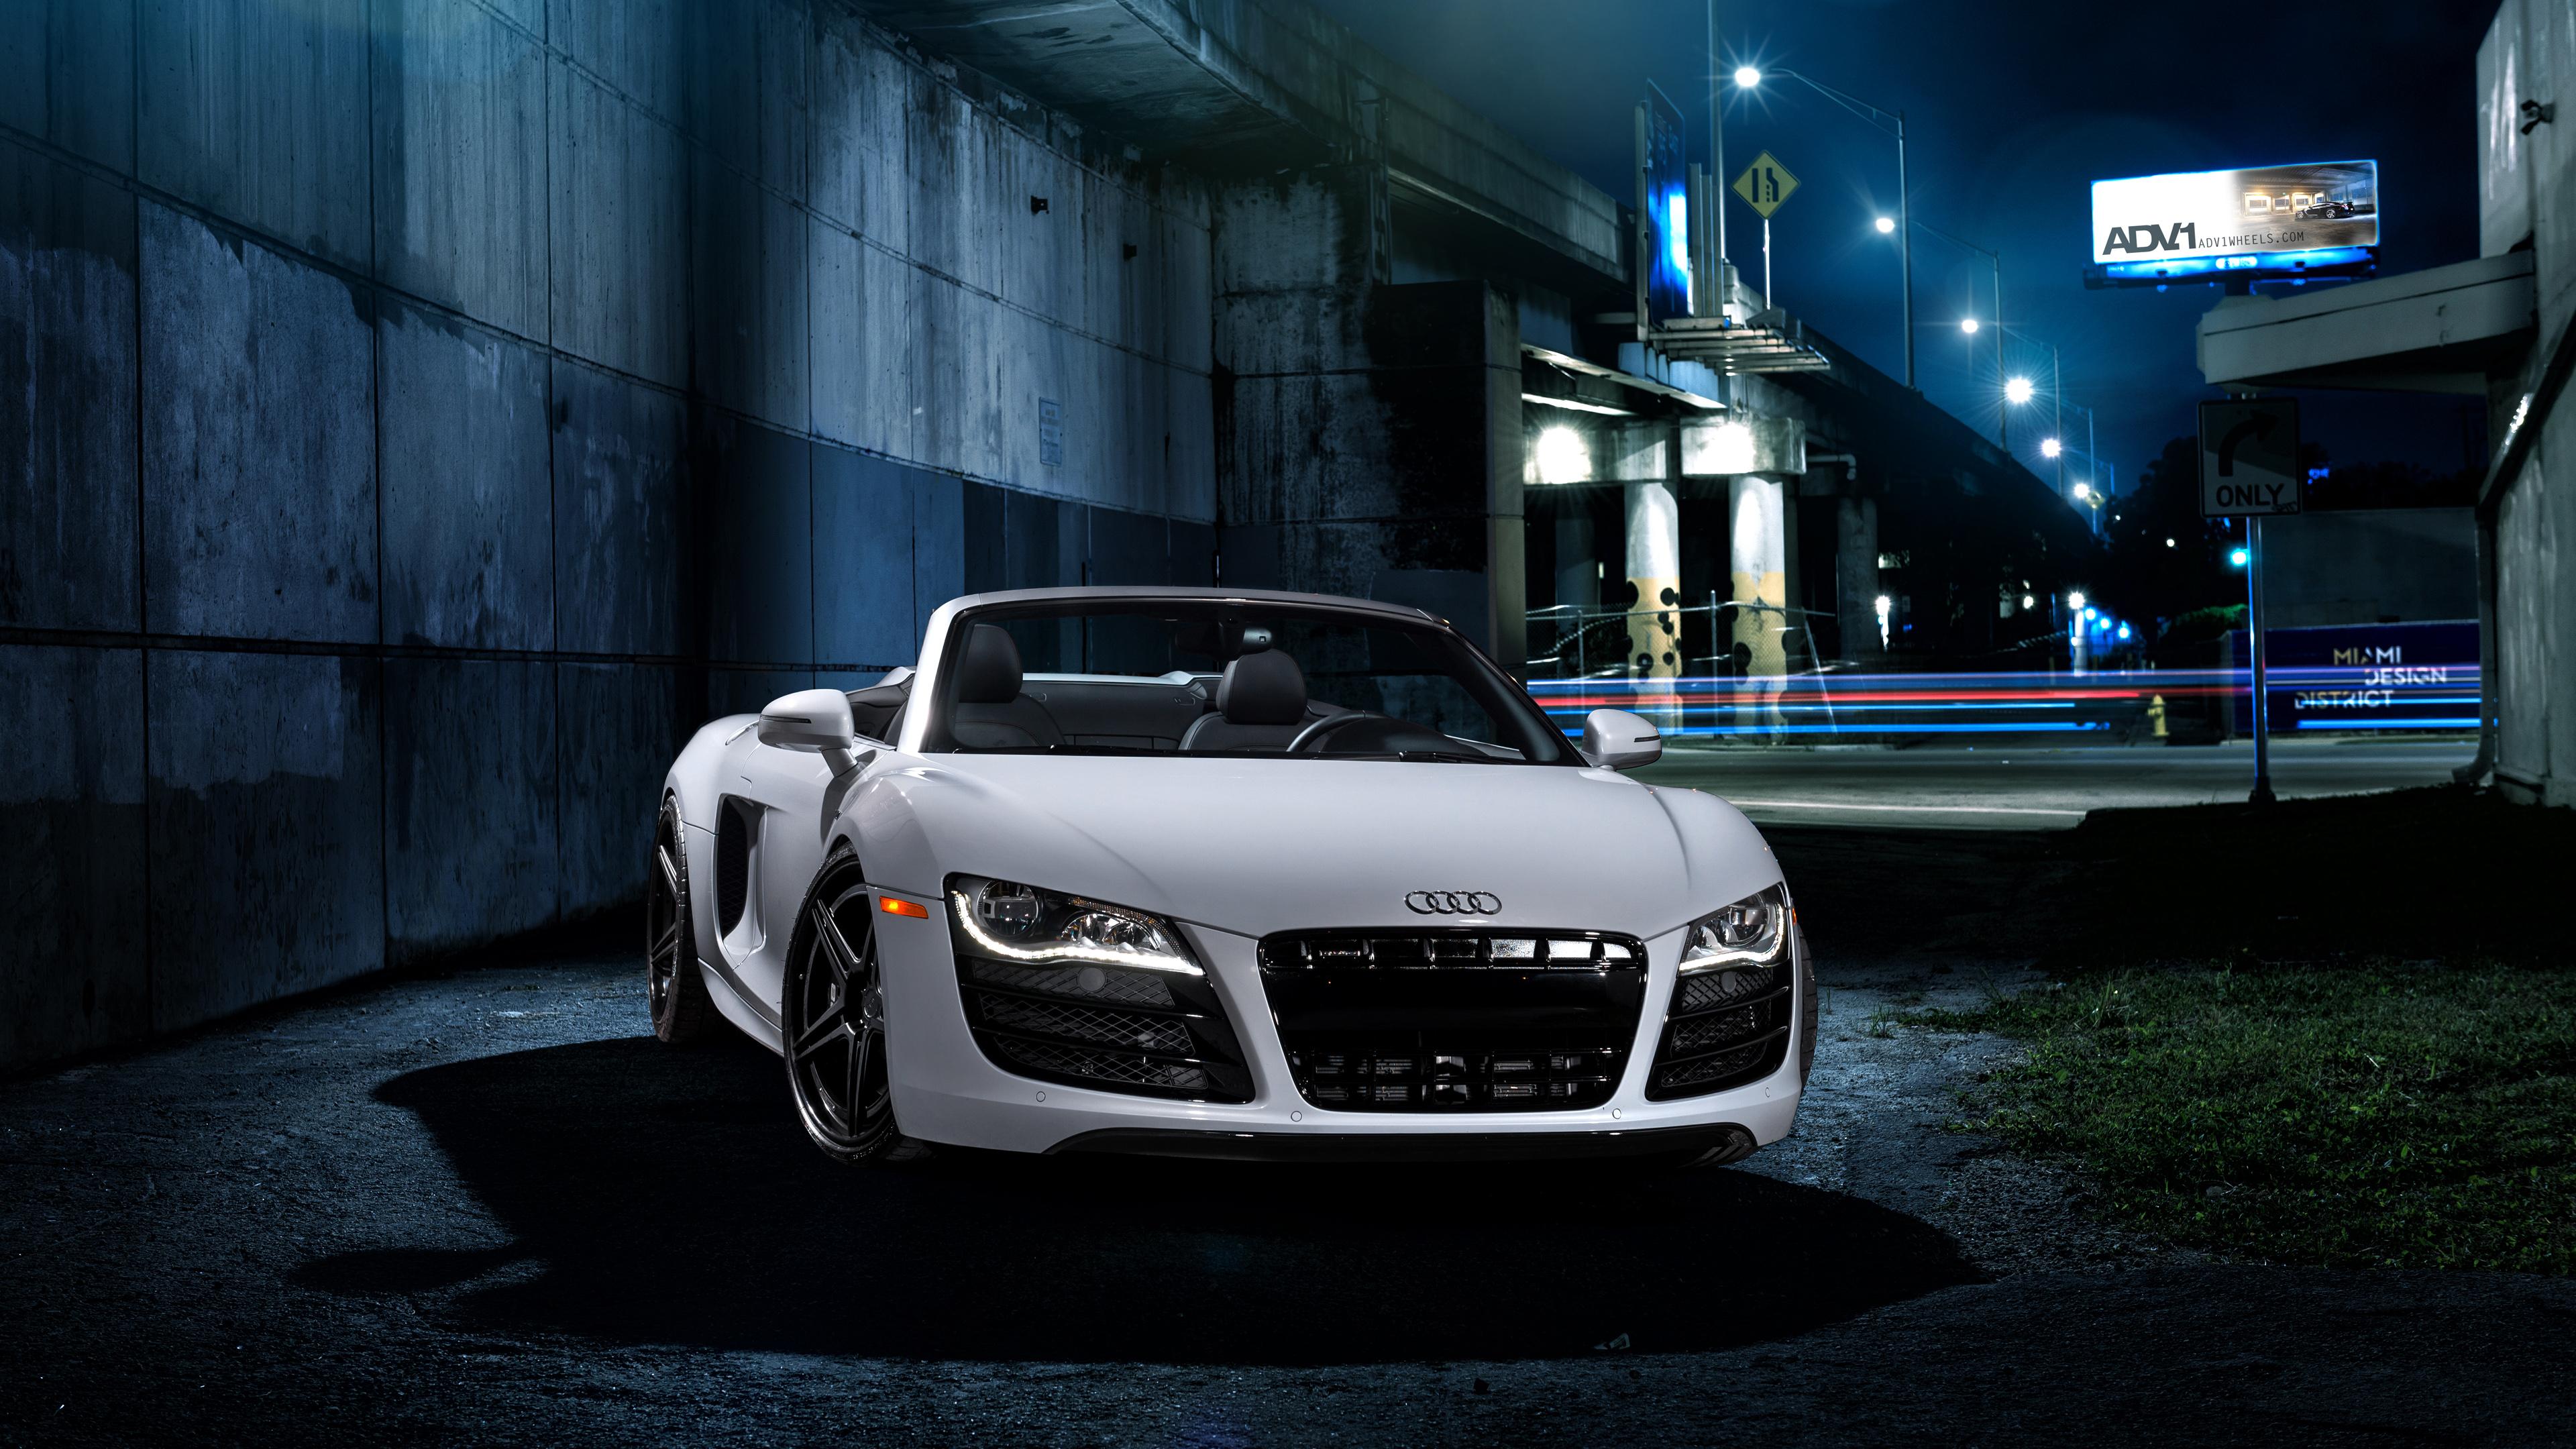 adv1 audi r8 v10 wallpaper | hd car wallpapers | id #5508